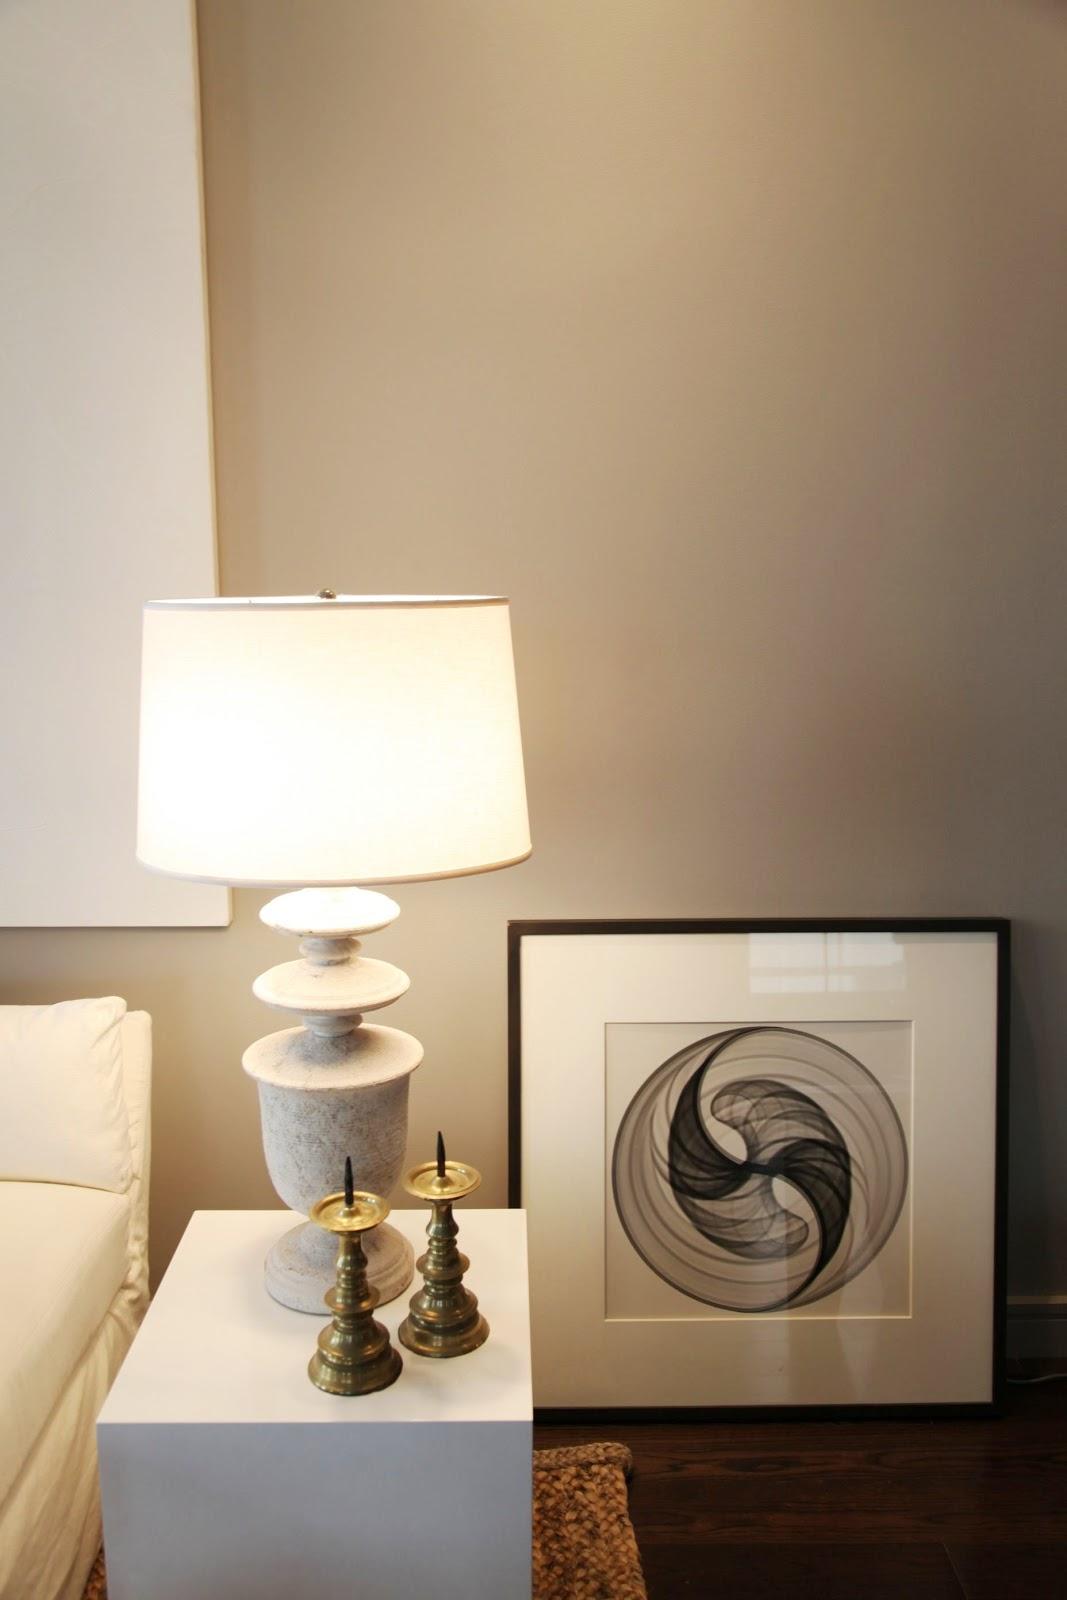 antony todd sofa wayfair covers minima home hearst designer visions